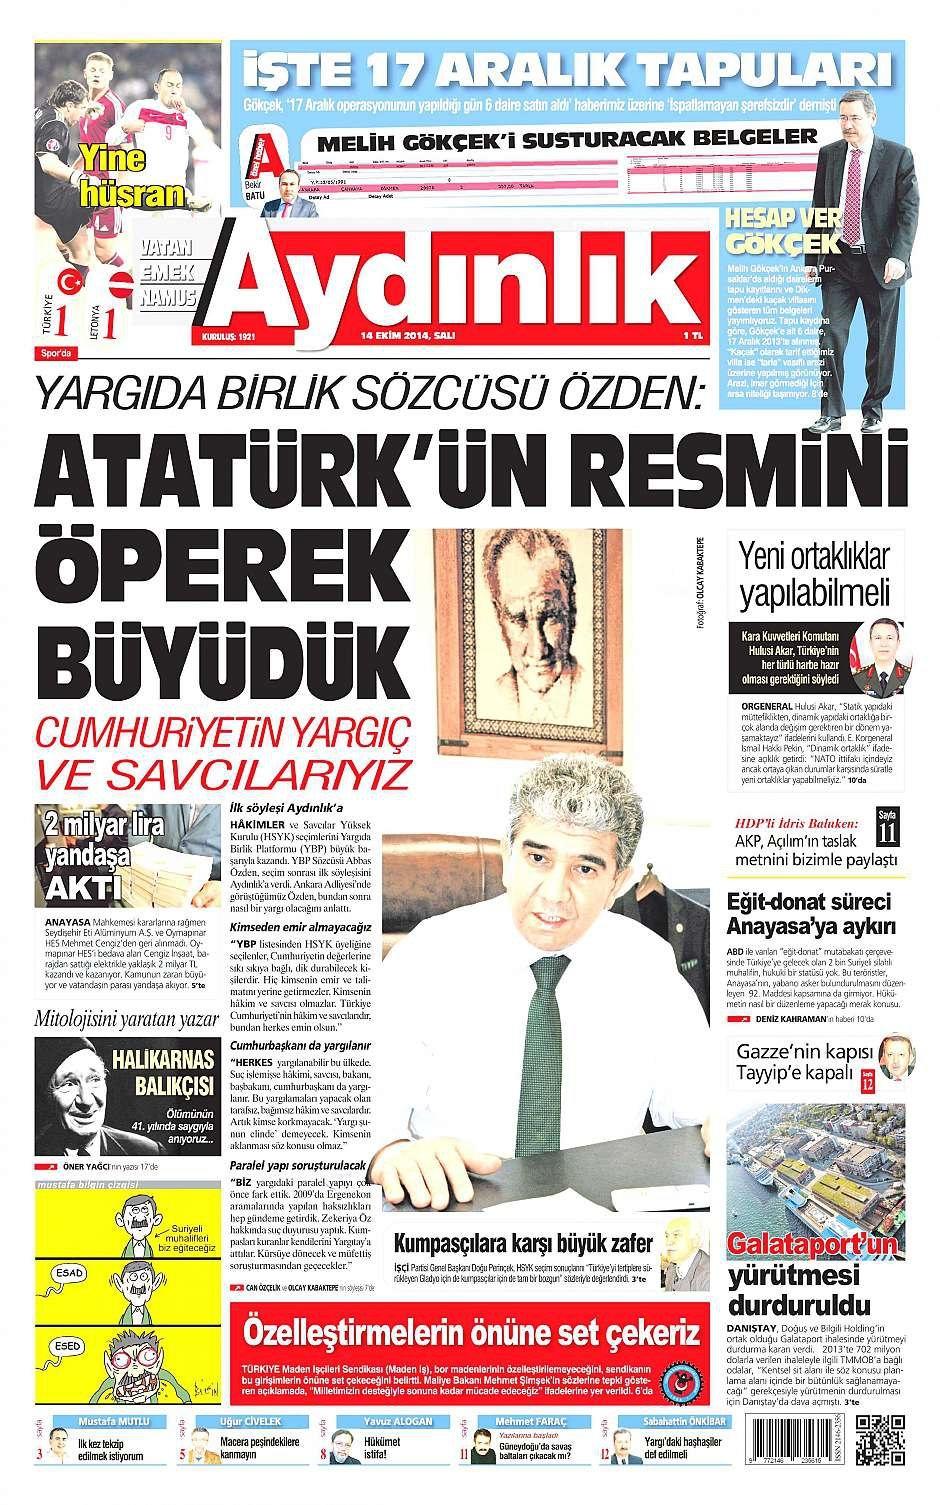 14 Ekim 2014 gazete manşetleri 21